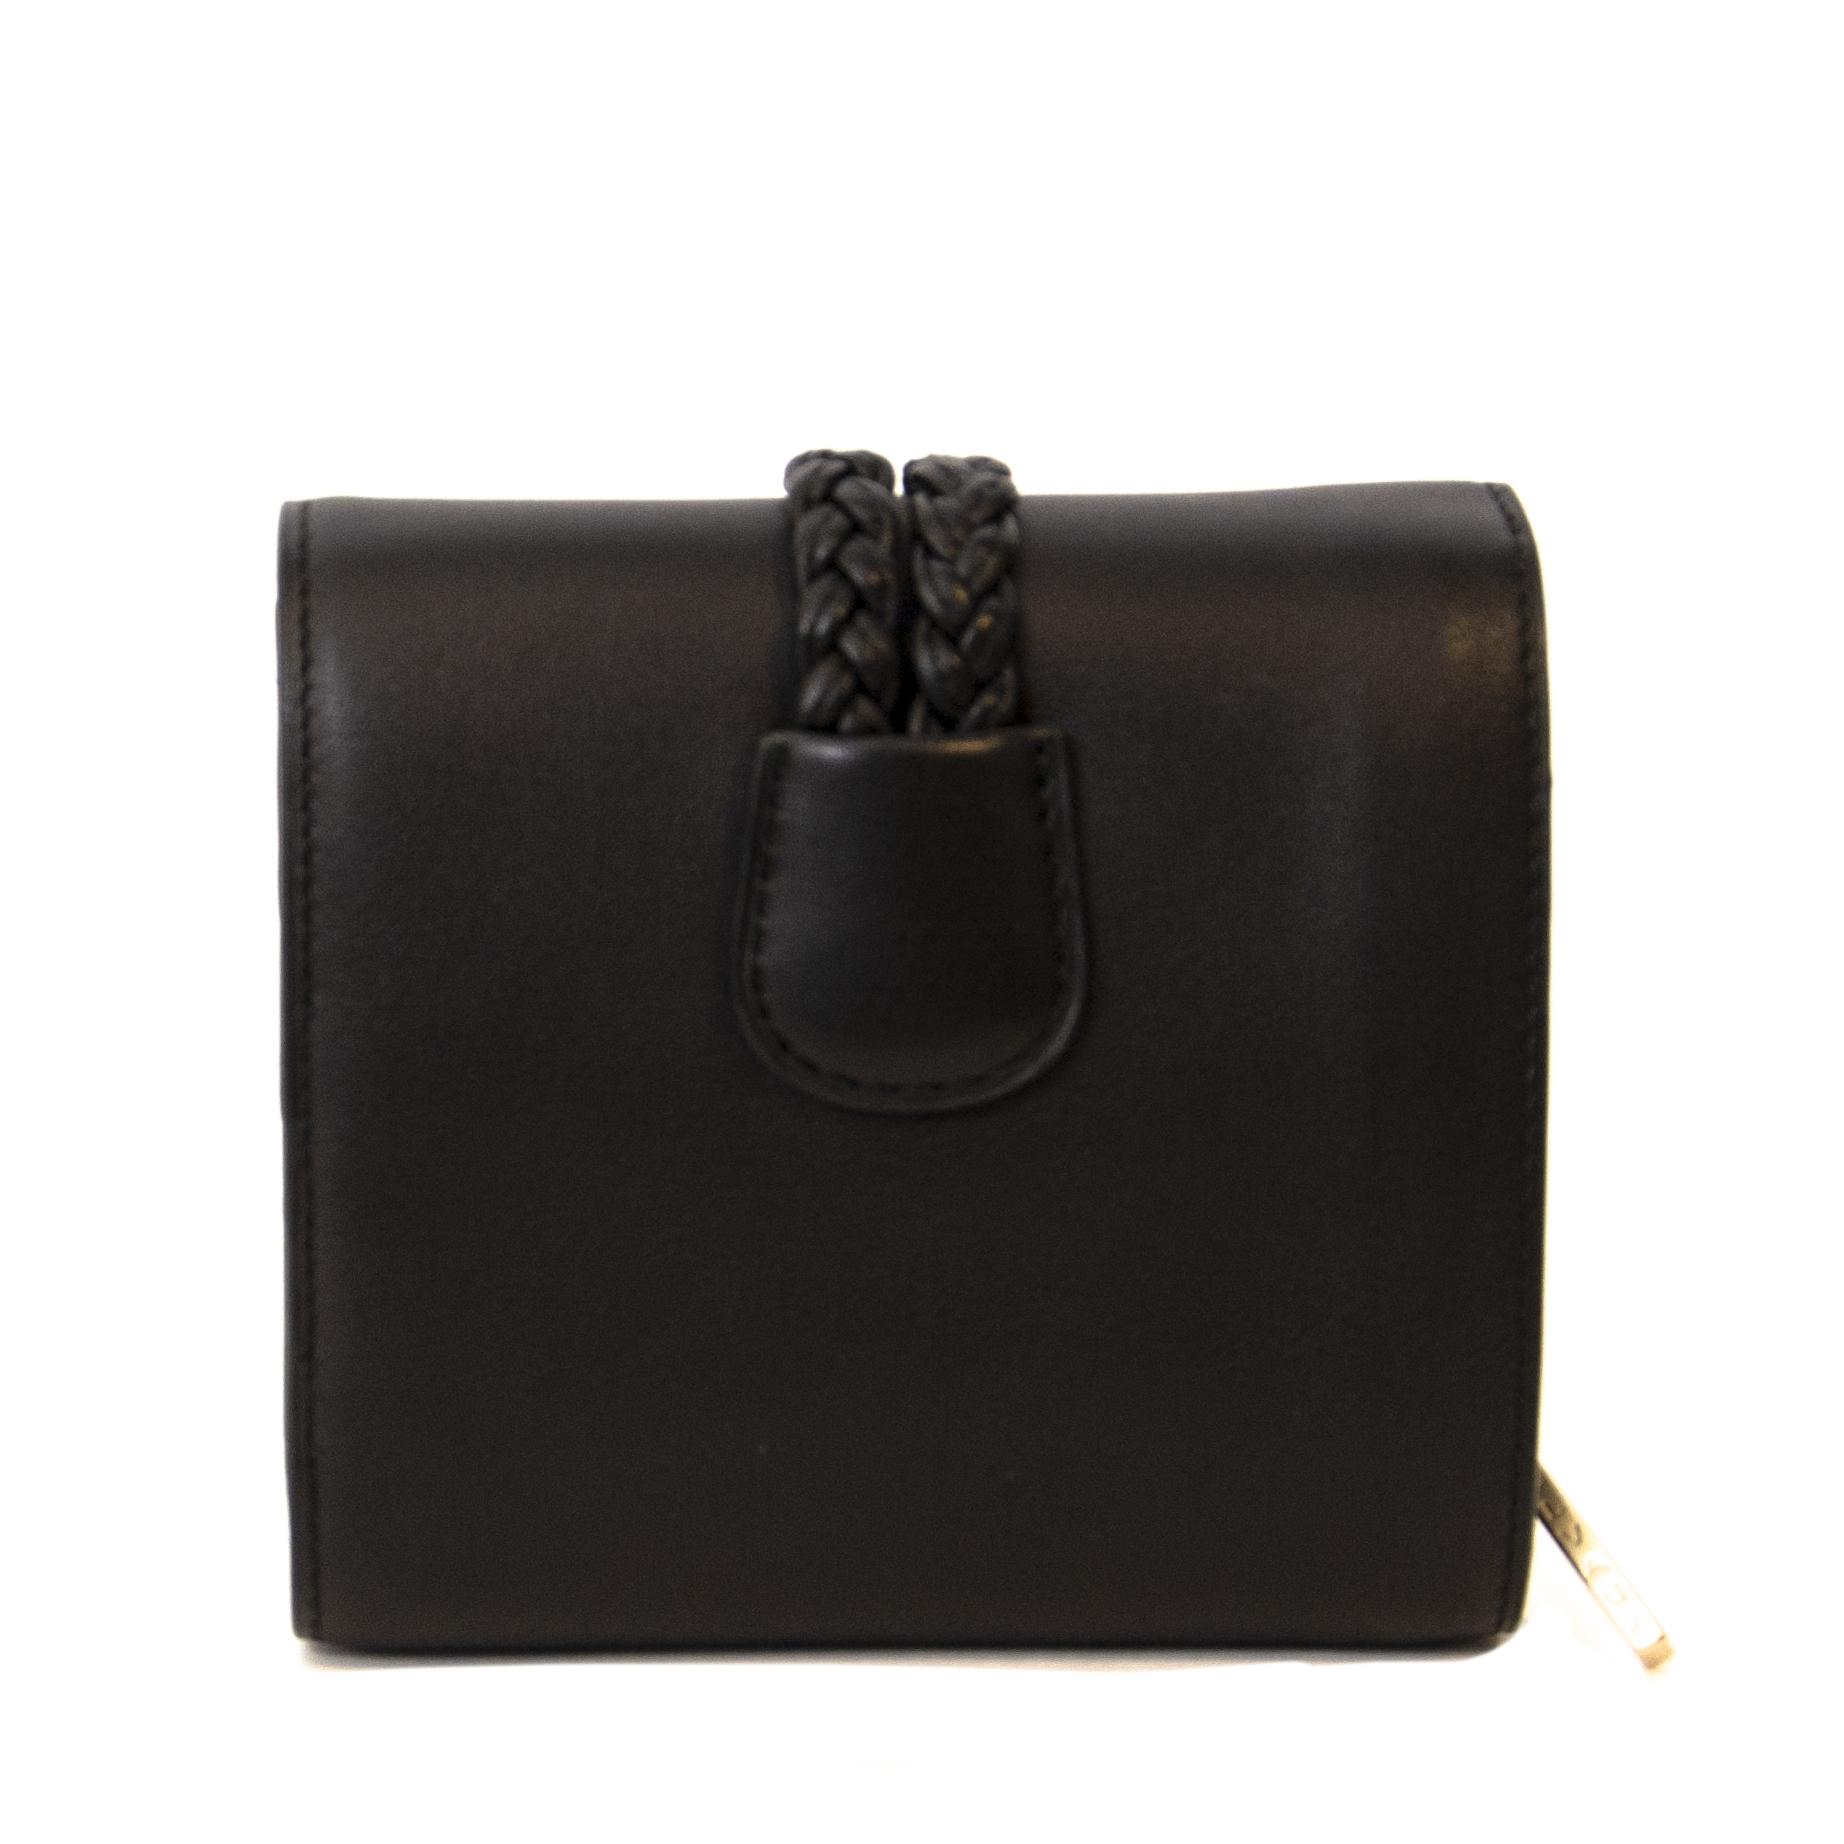 Buy authentic secondhand Delvaux handbag for the right price at LabelLOV webshop. Safe and secure shopping. Koop authentieke tweedehands Miu miu handtas voor de juiste prijs.